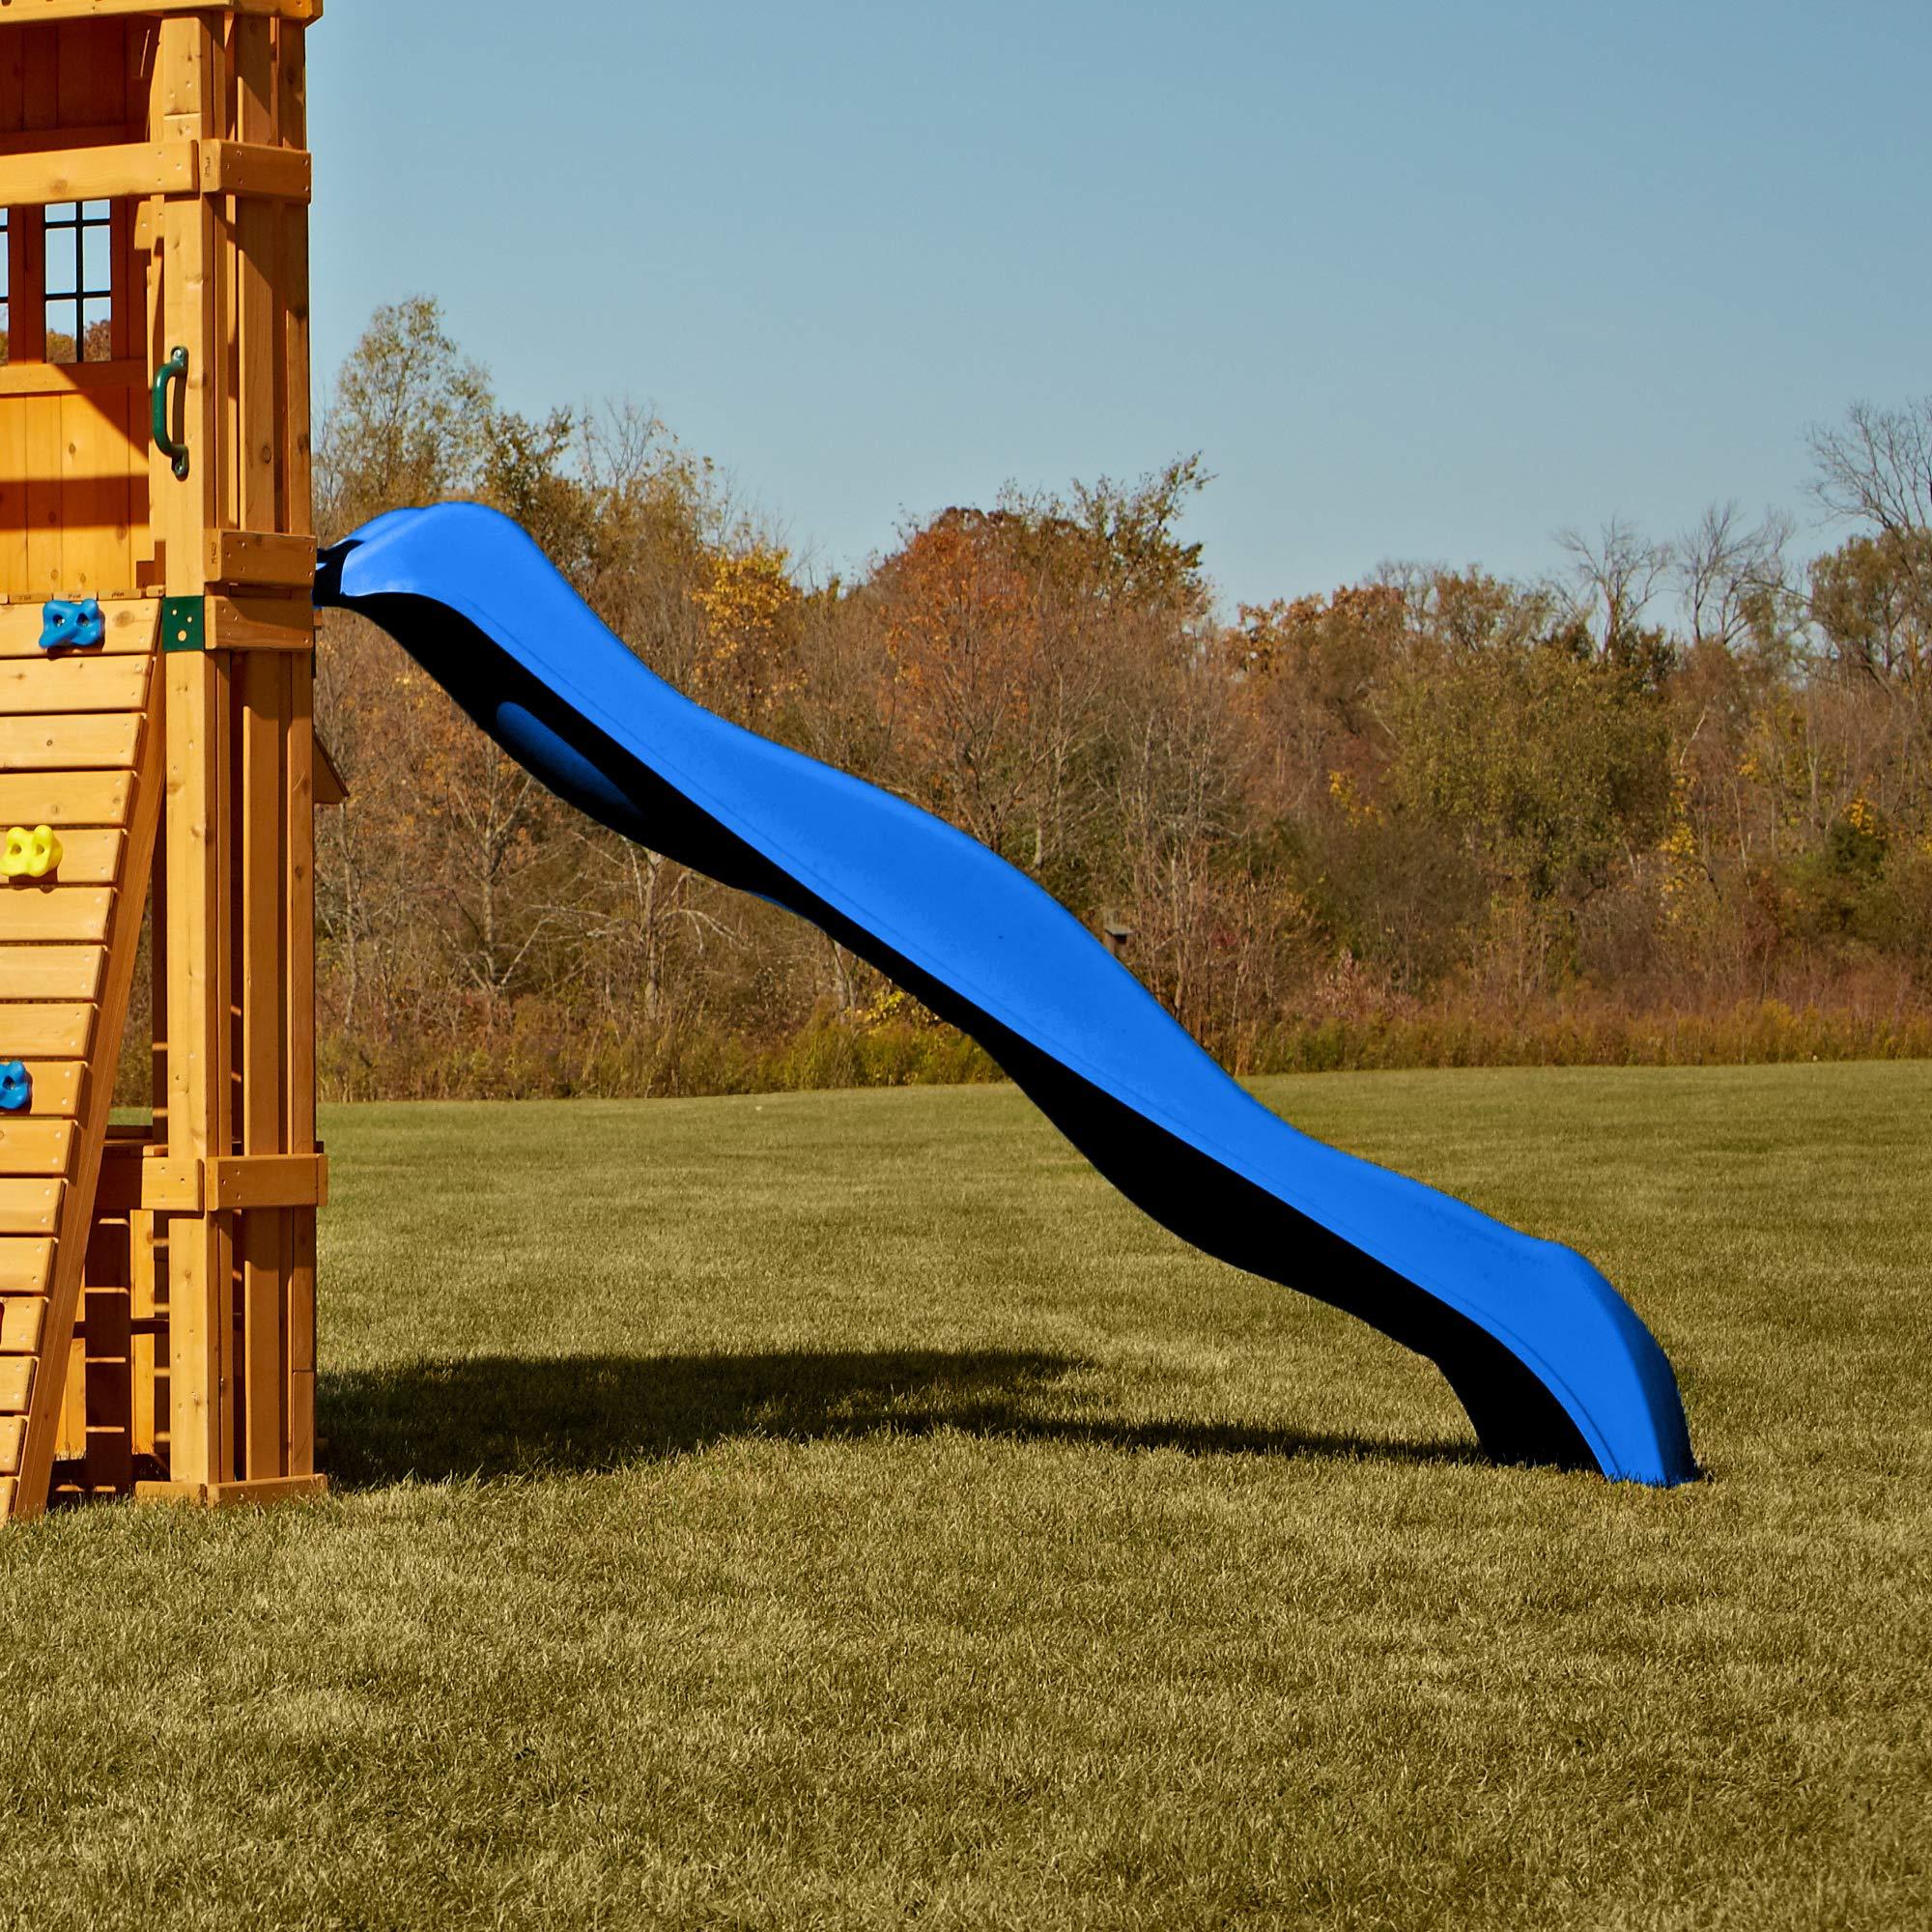 Swing-N-Slide NE 3054 Speedwave Slide Plastic Slide for 4' Decks with, Blue by Swing-N-Slide (Image #4)